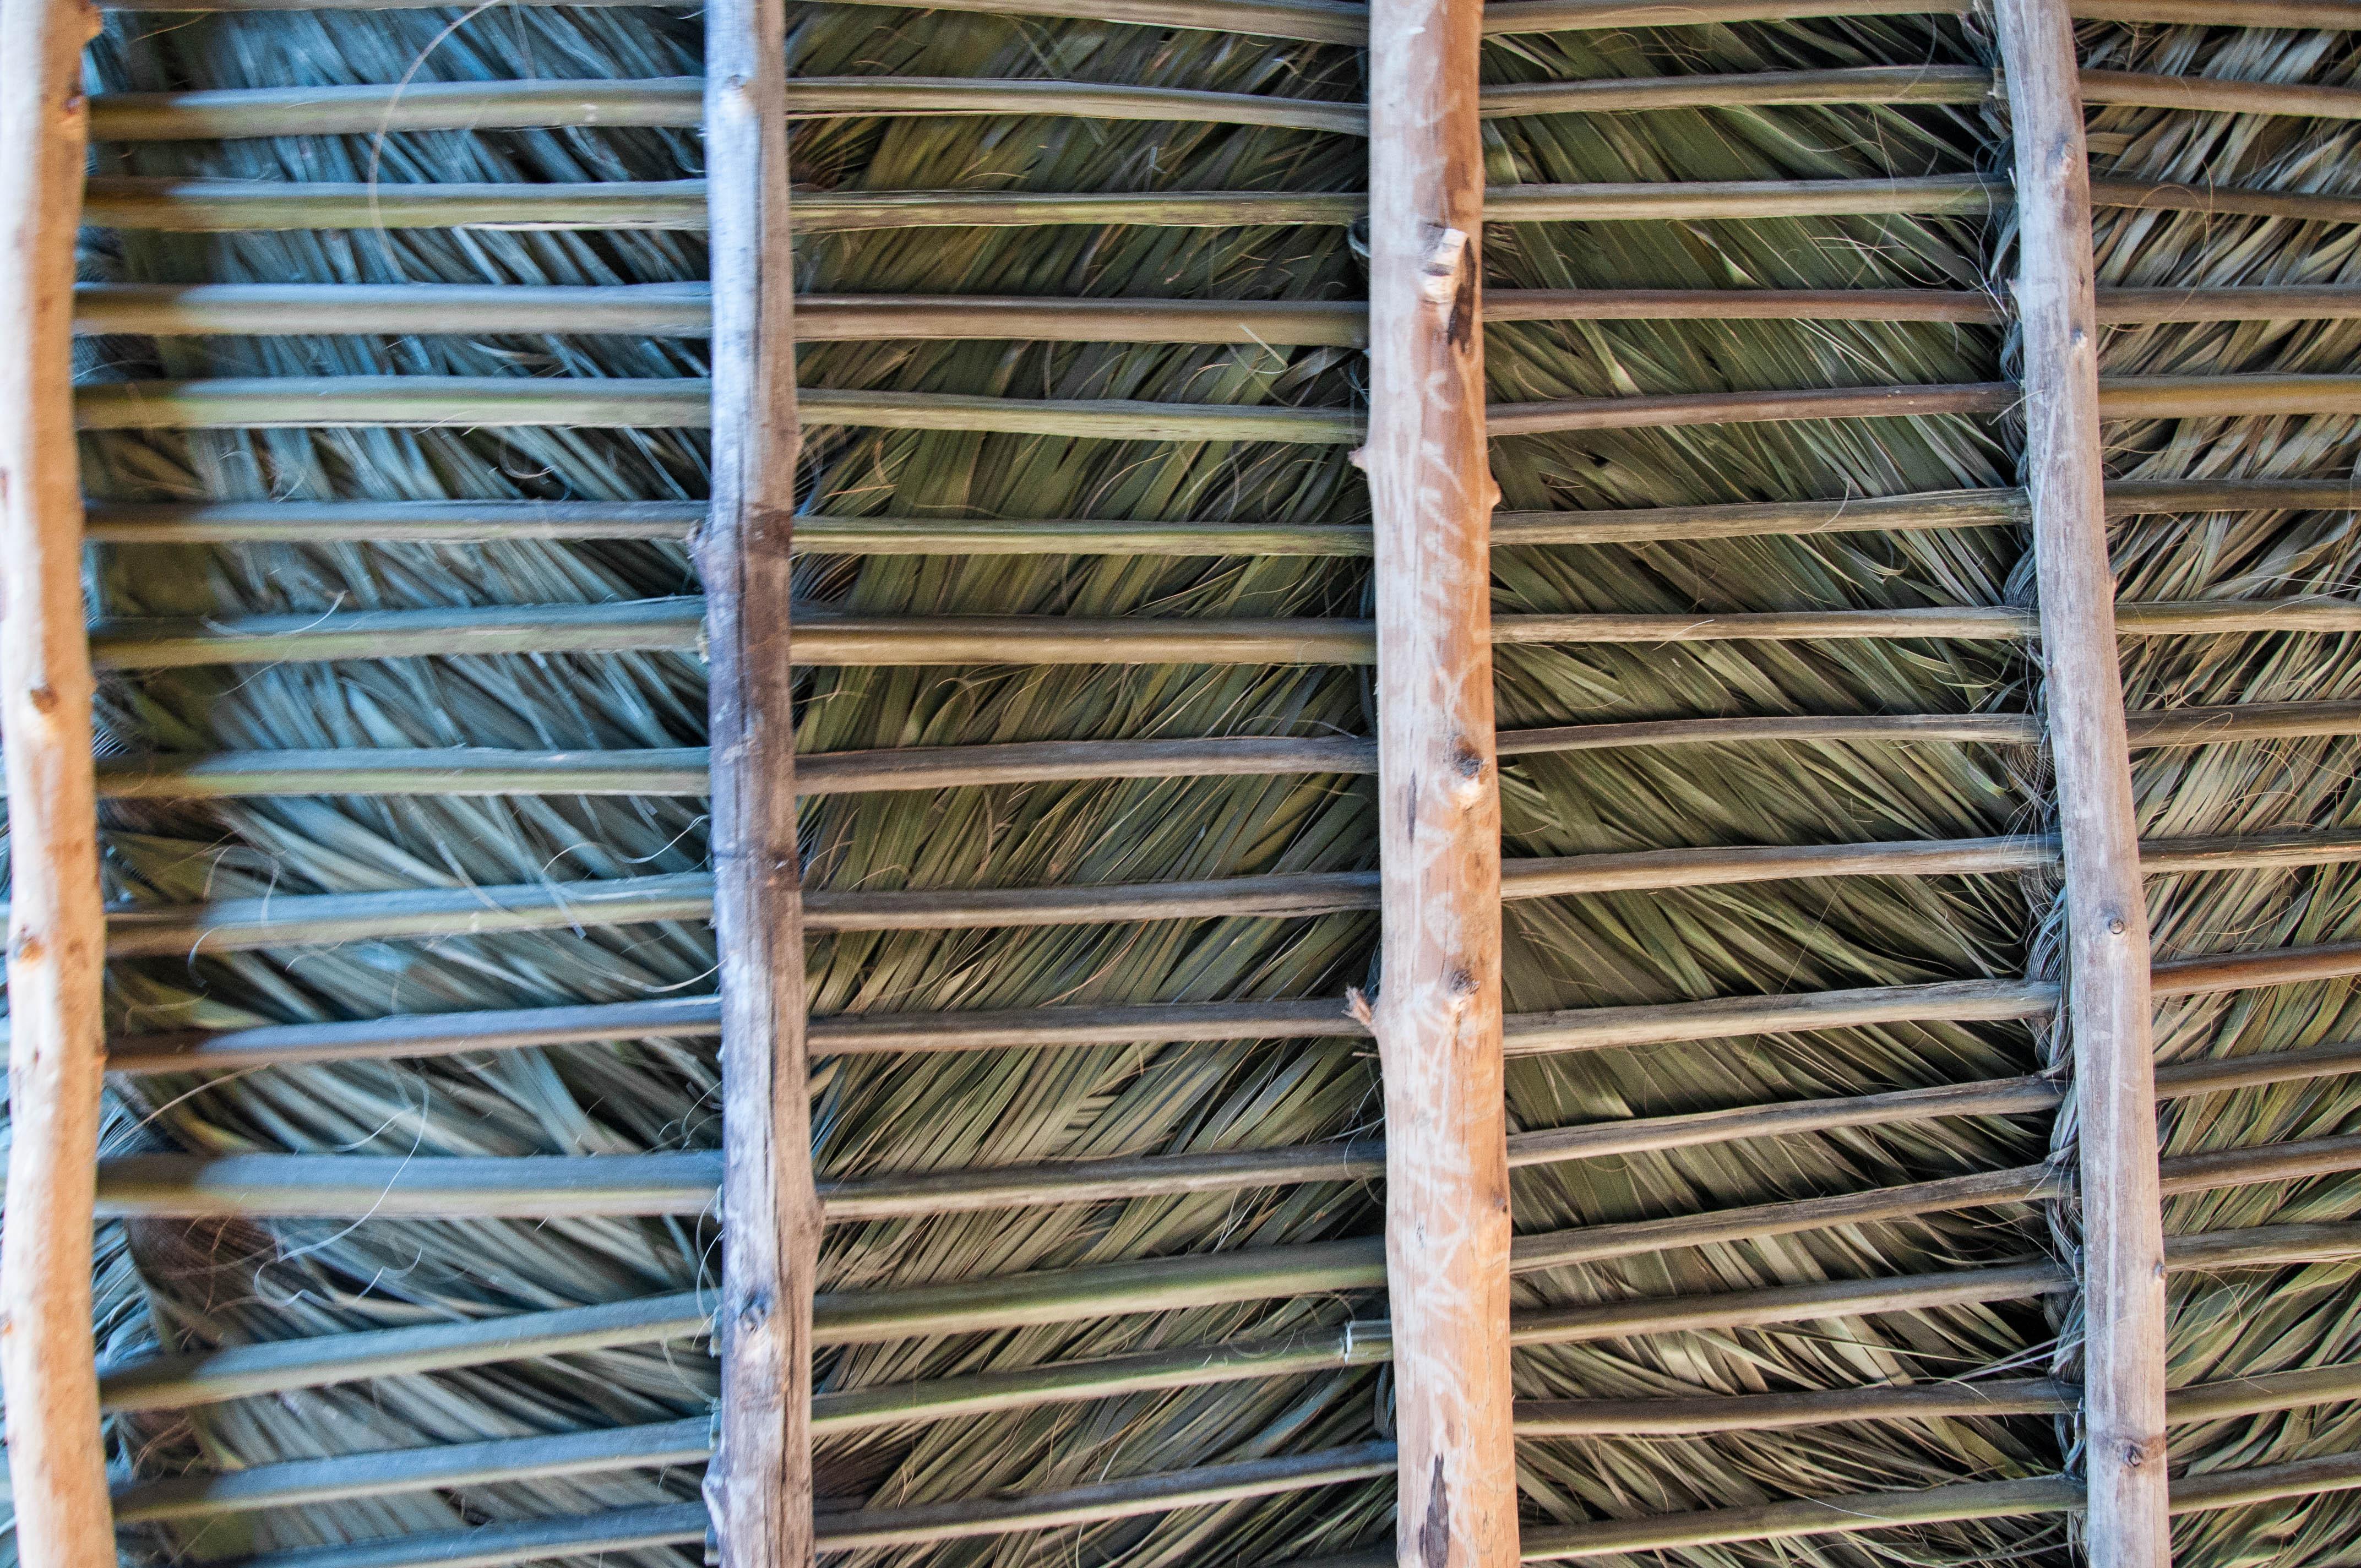 Palm Thatch Underside, Maui, Hawaii